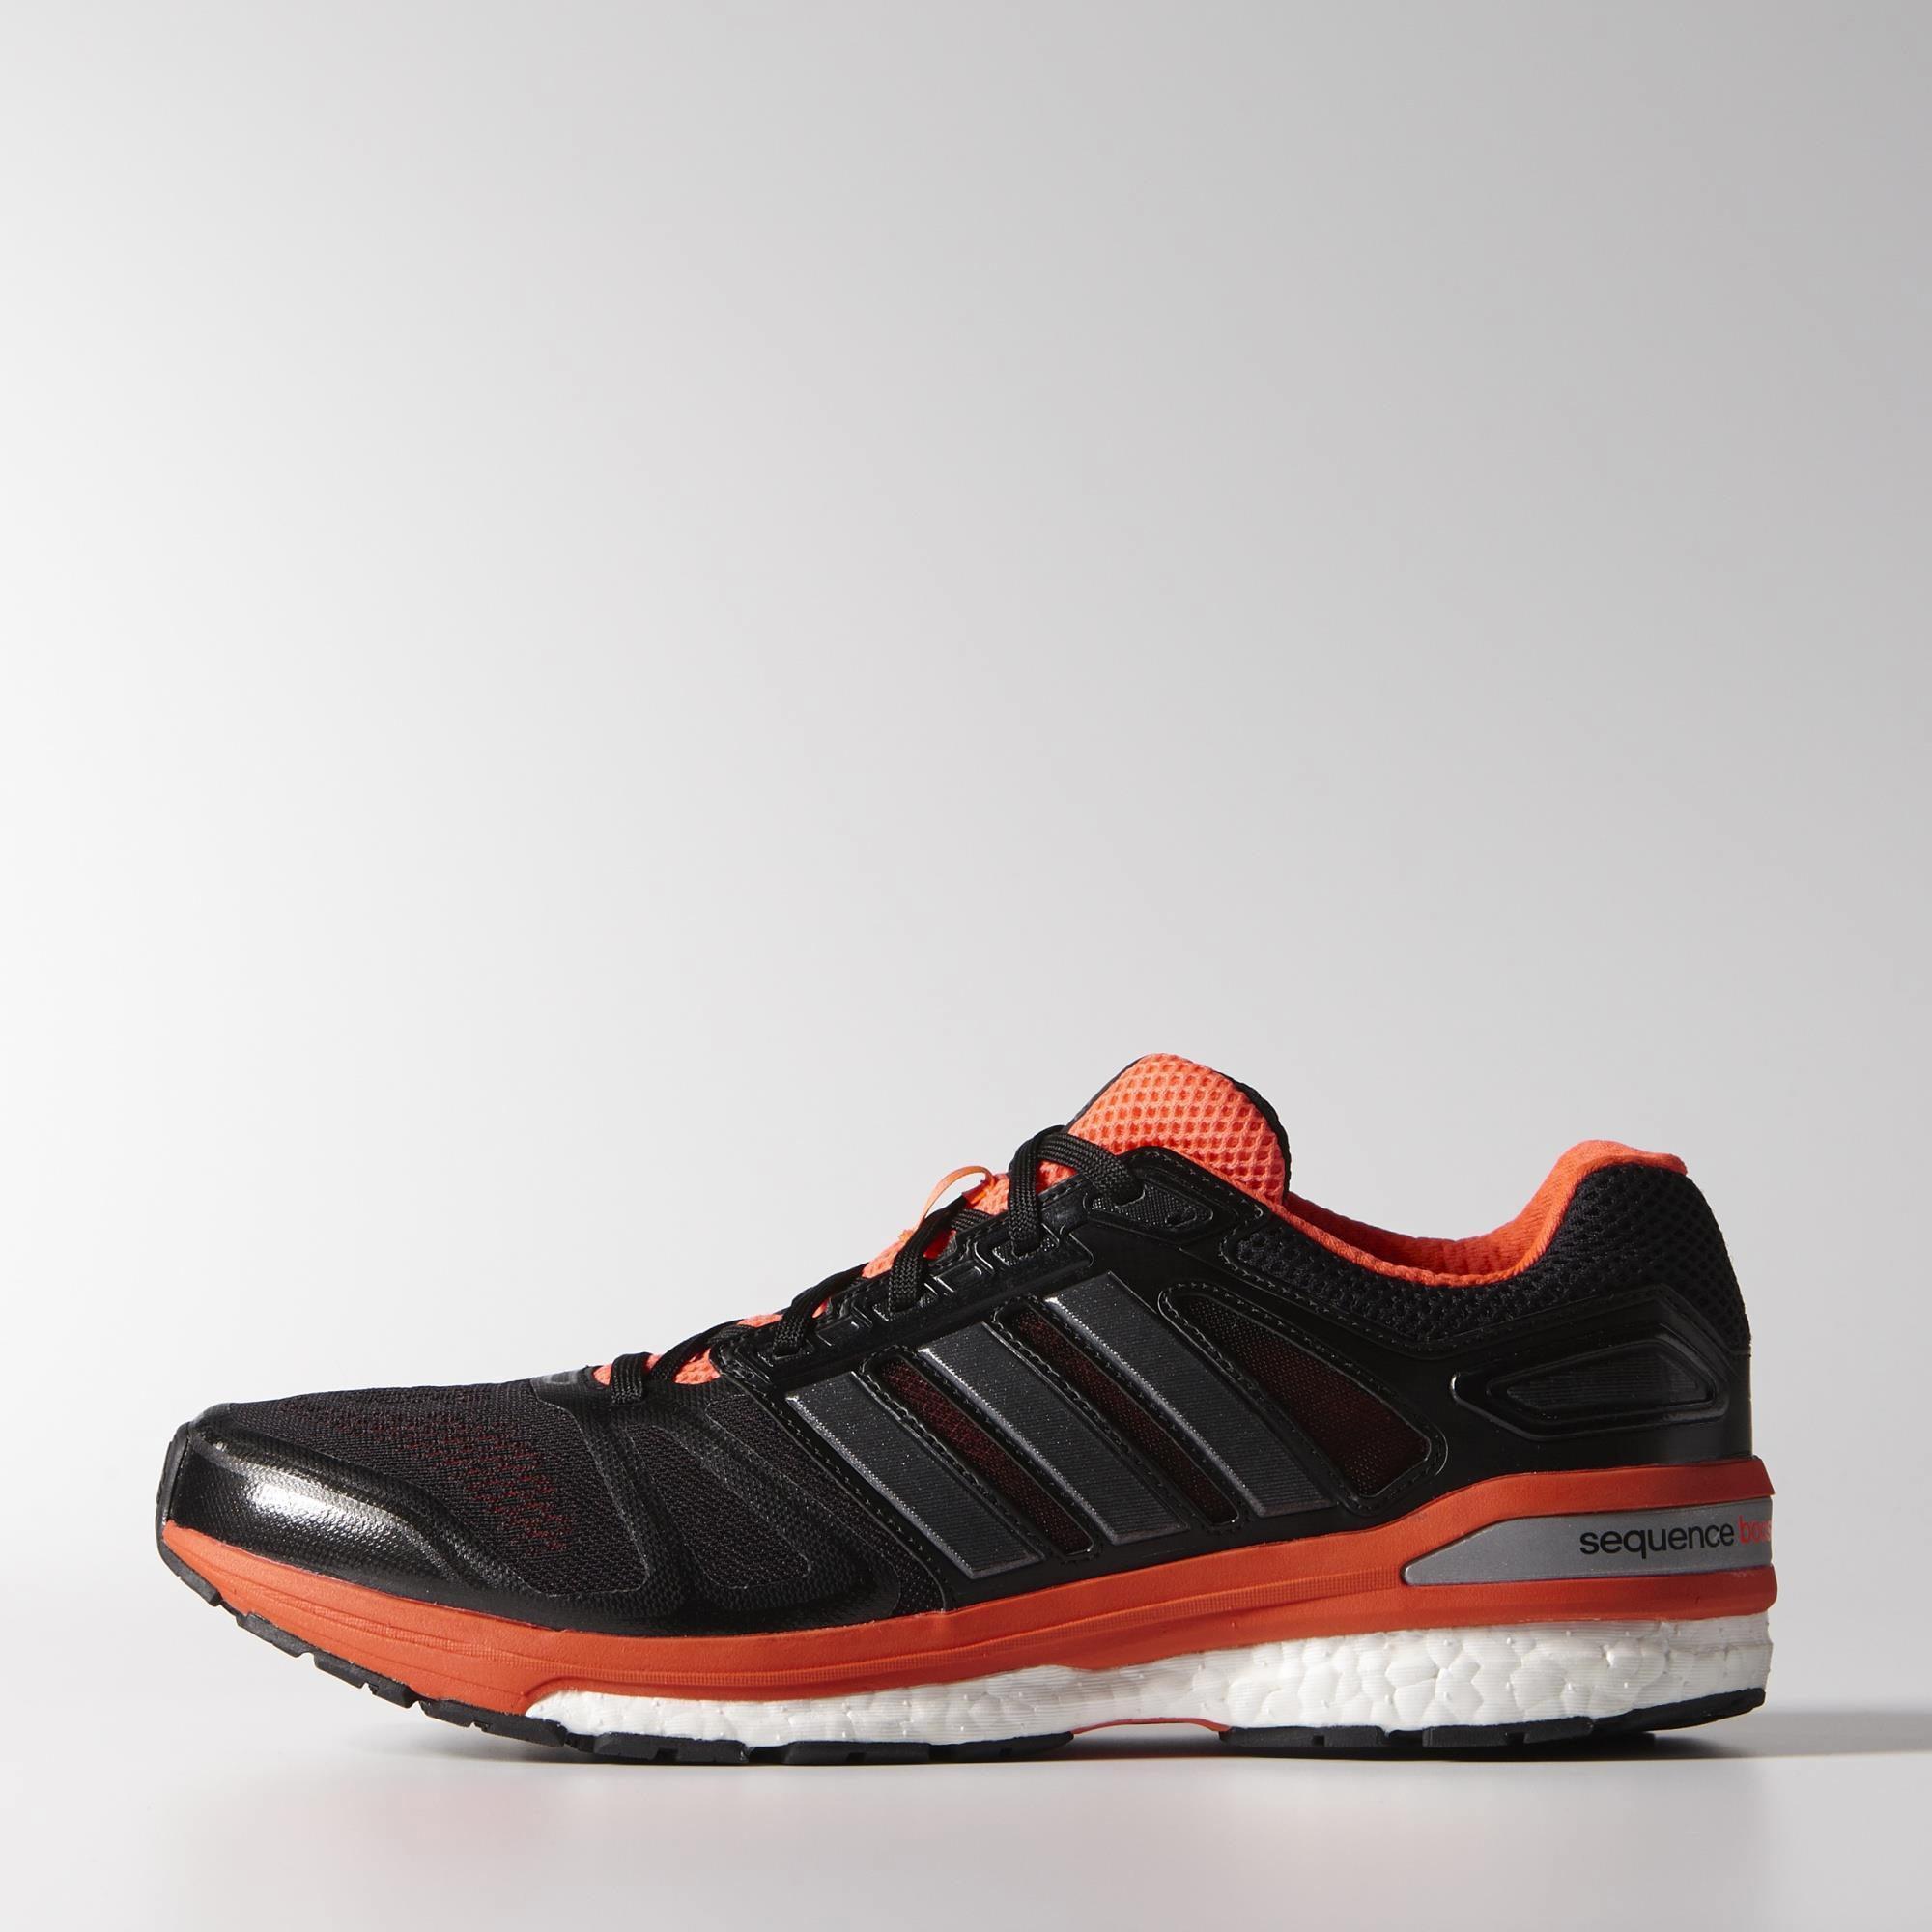 5deb613d6 Adidas Mens Supernova Sequence Boost 7 Running Shoes - Black Infrared -  Tennisnuts.com